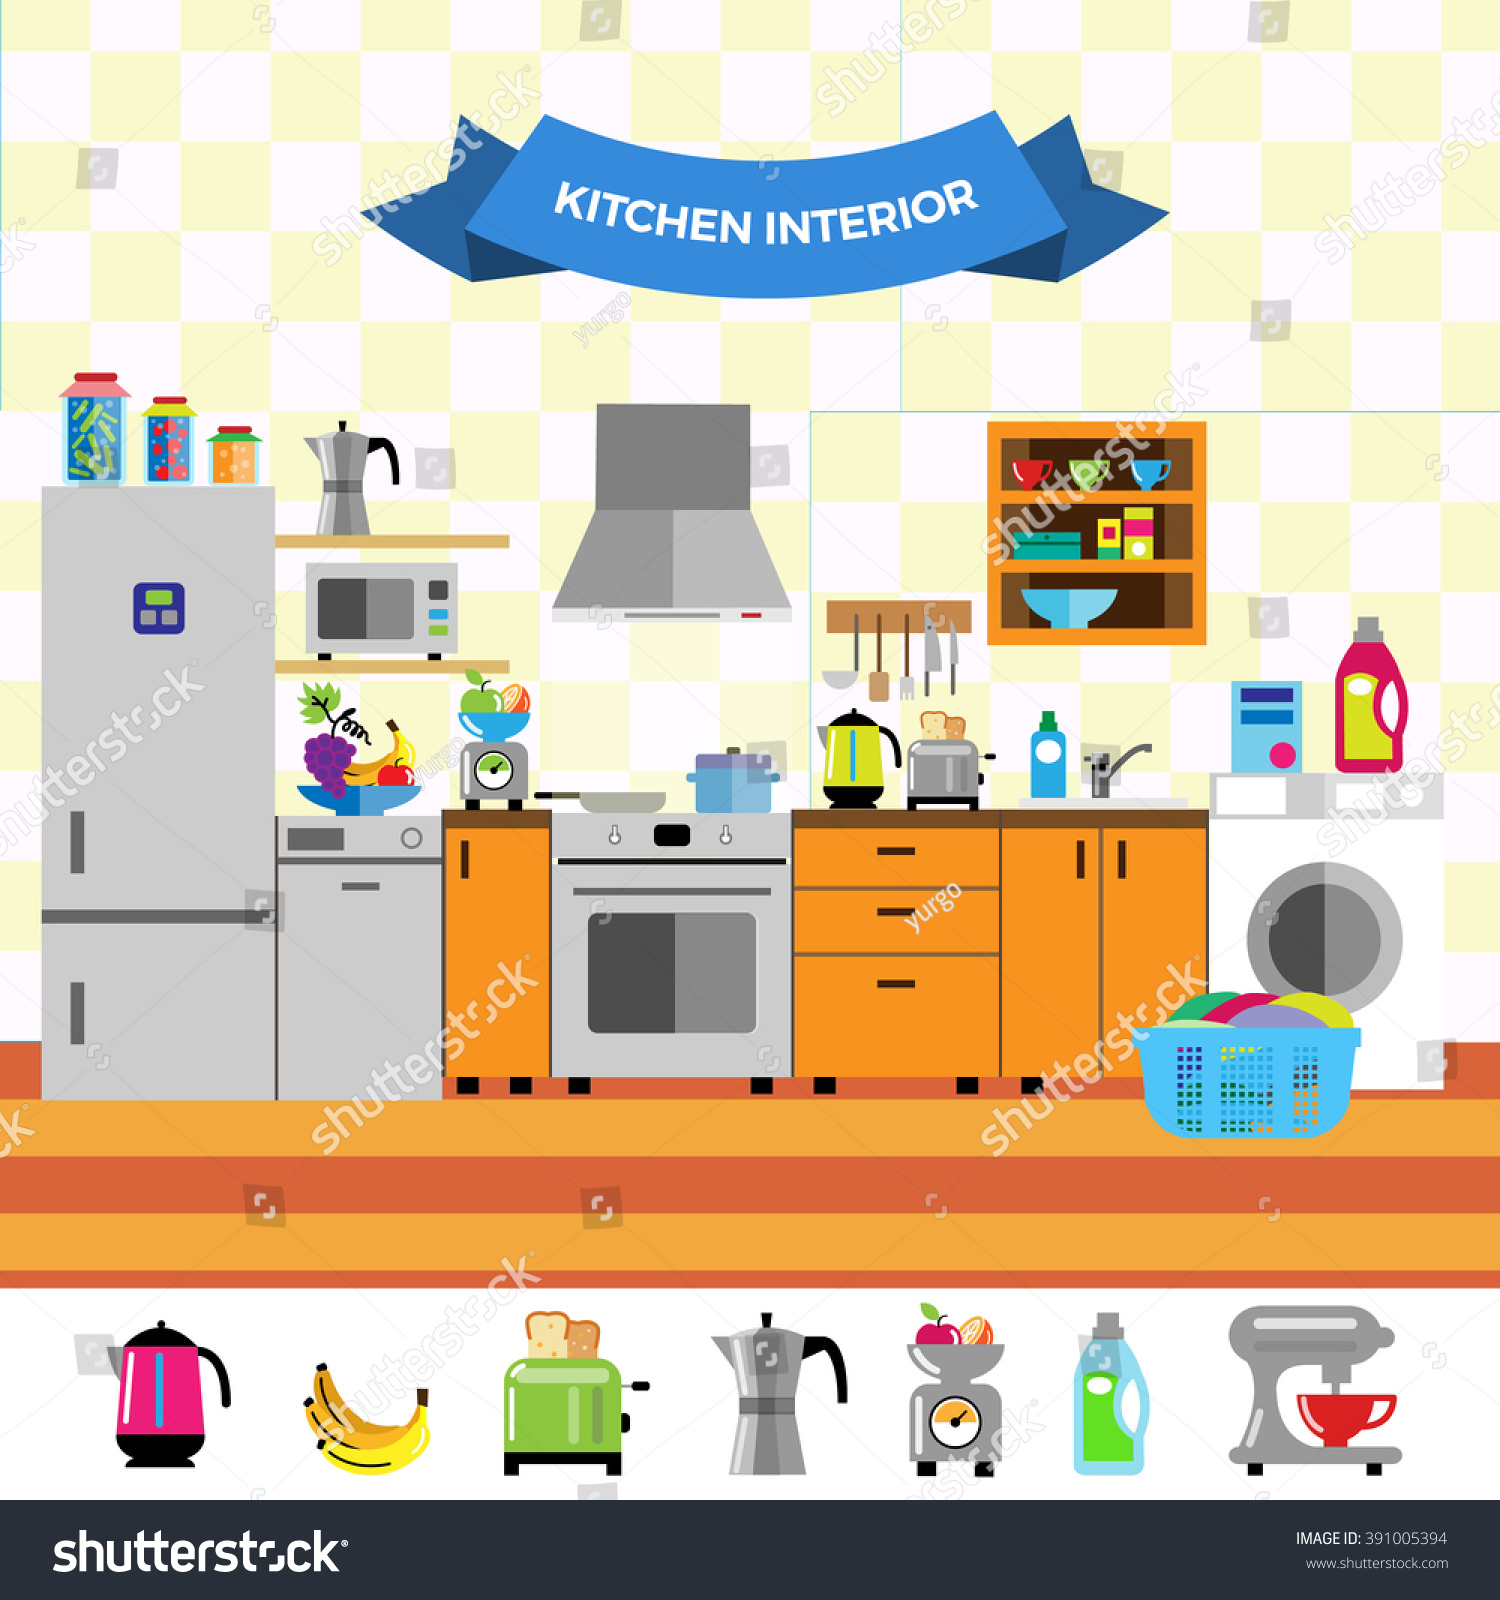 images images photos vectors illustrations footage music cost house floor plans bid cozy cost interior designer kitchen